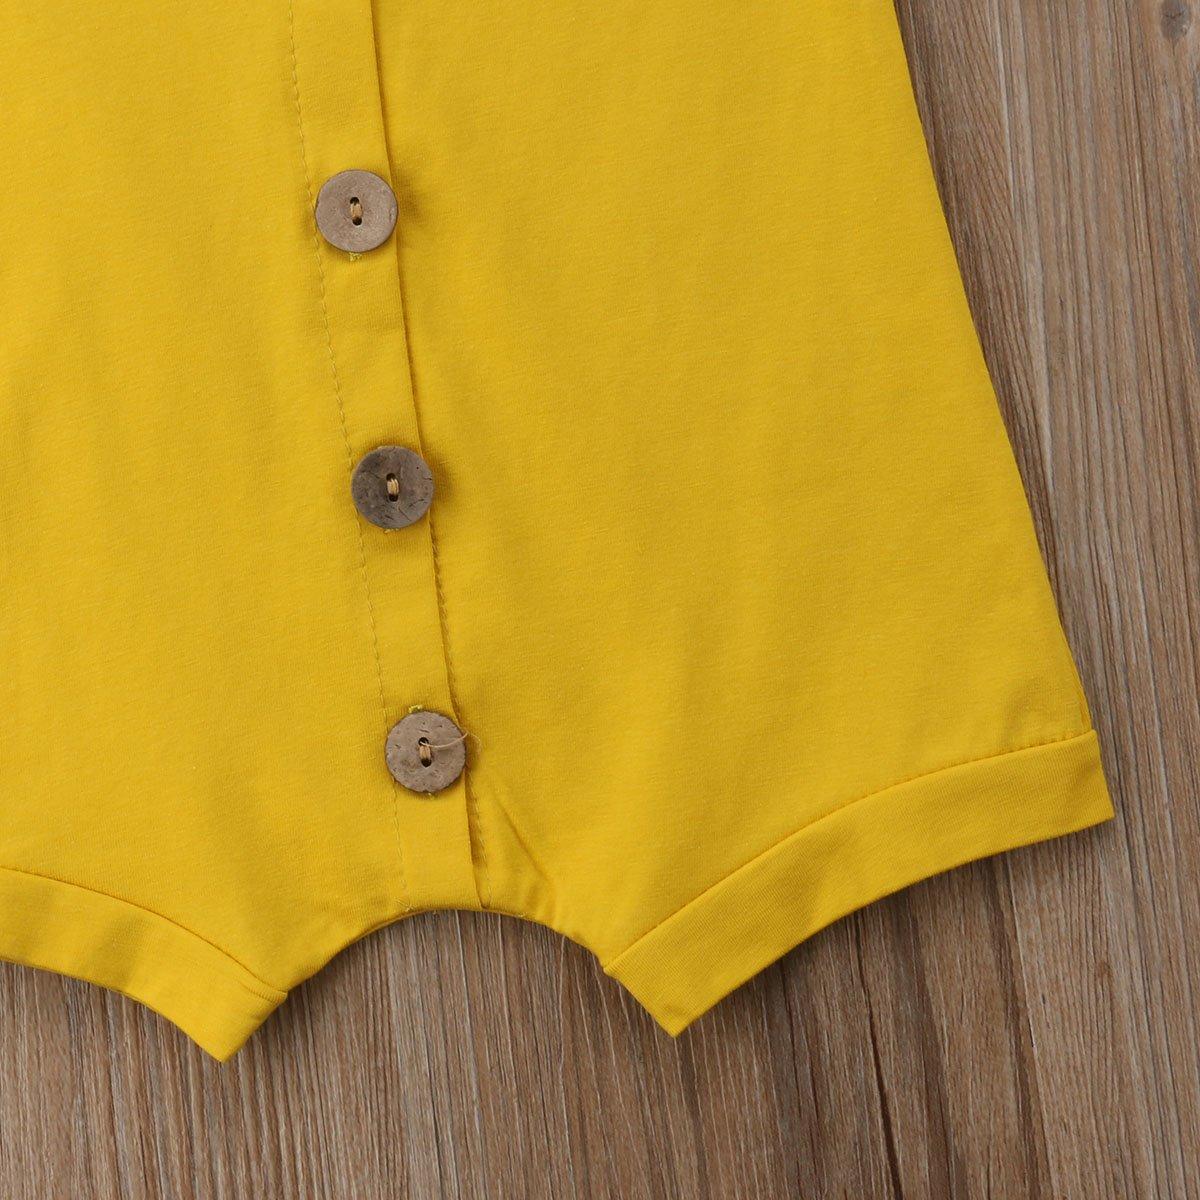 Meipitgy Infant Newborn Baby Boys Girls Romper Bodysuit Jumpsuit Outfits Overalls Clothes 0-24 M Black